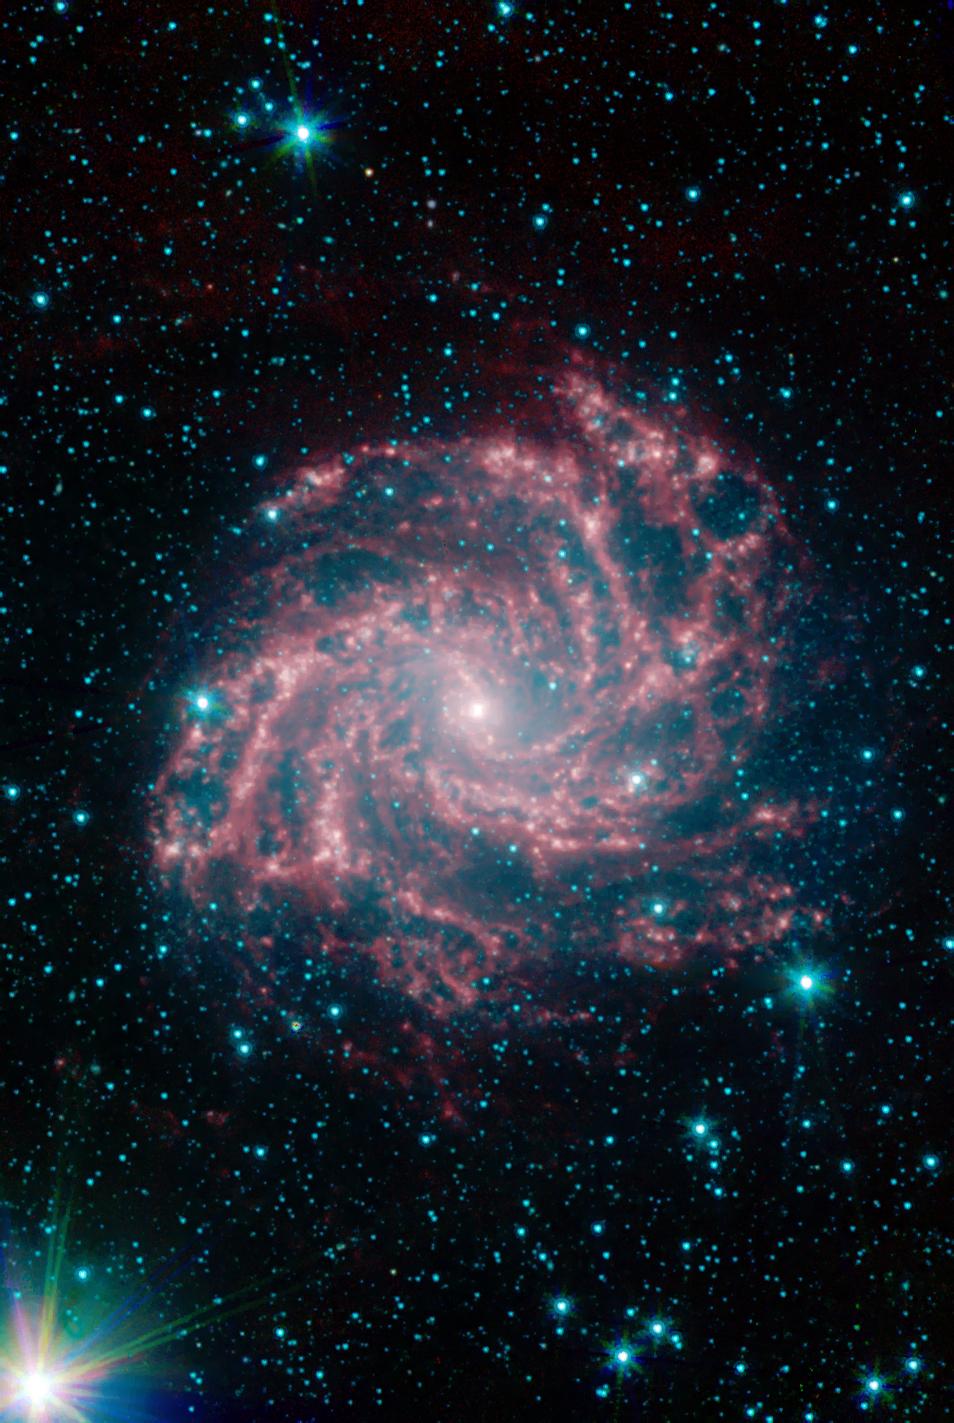 http://upload.wikimedia.org/wikipedia/commons/f/f3/Fireworks_Galaxis_Sig08-008.jpg